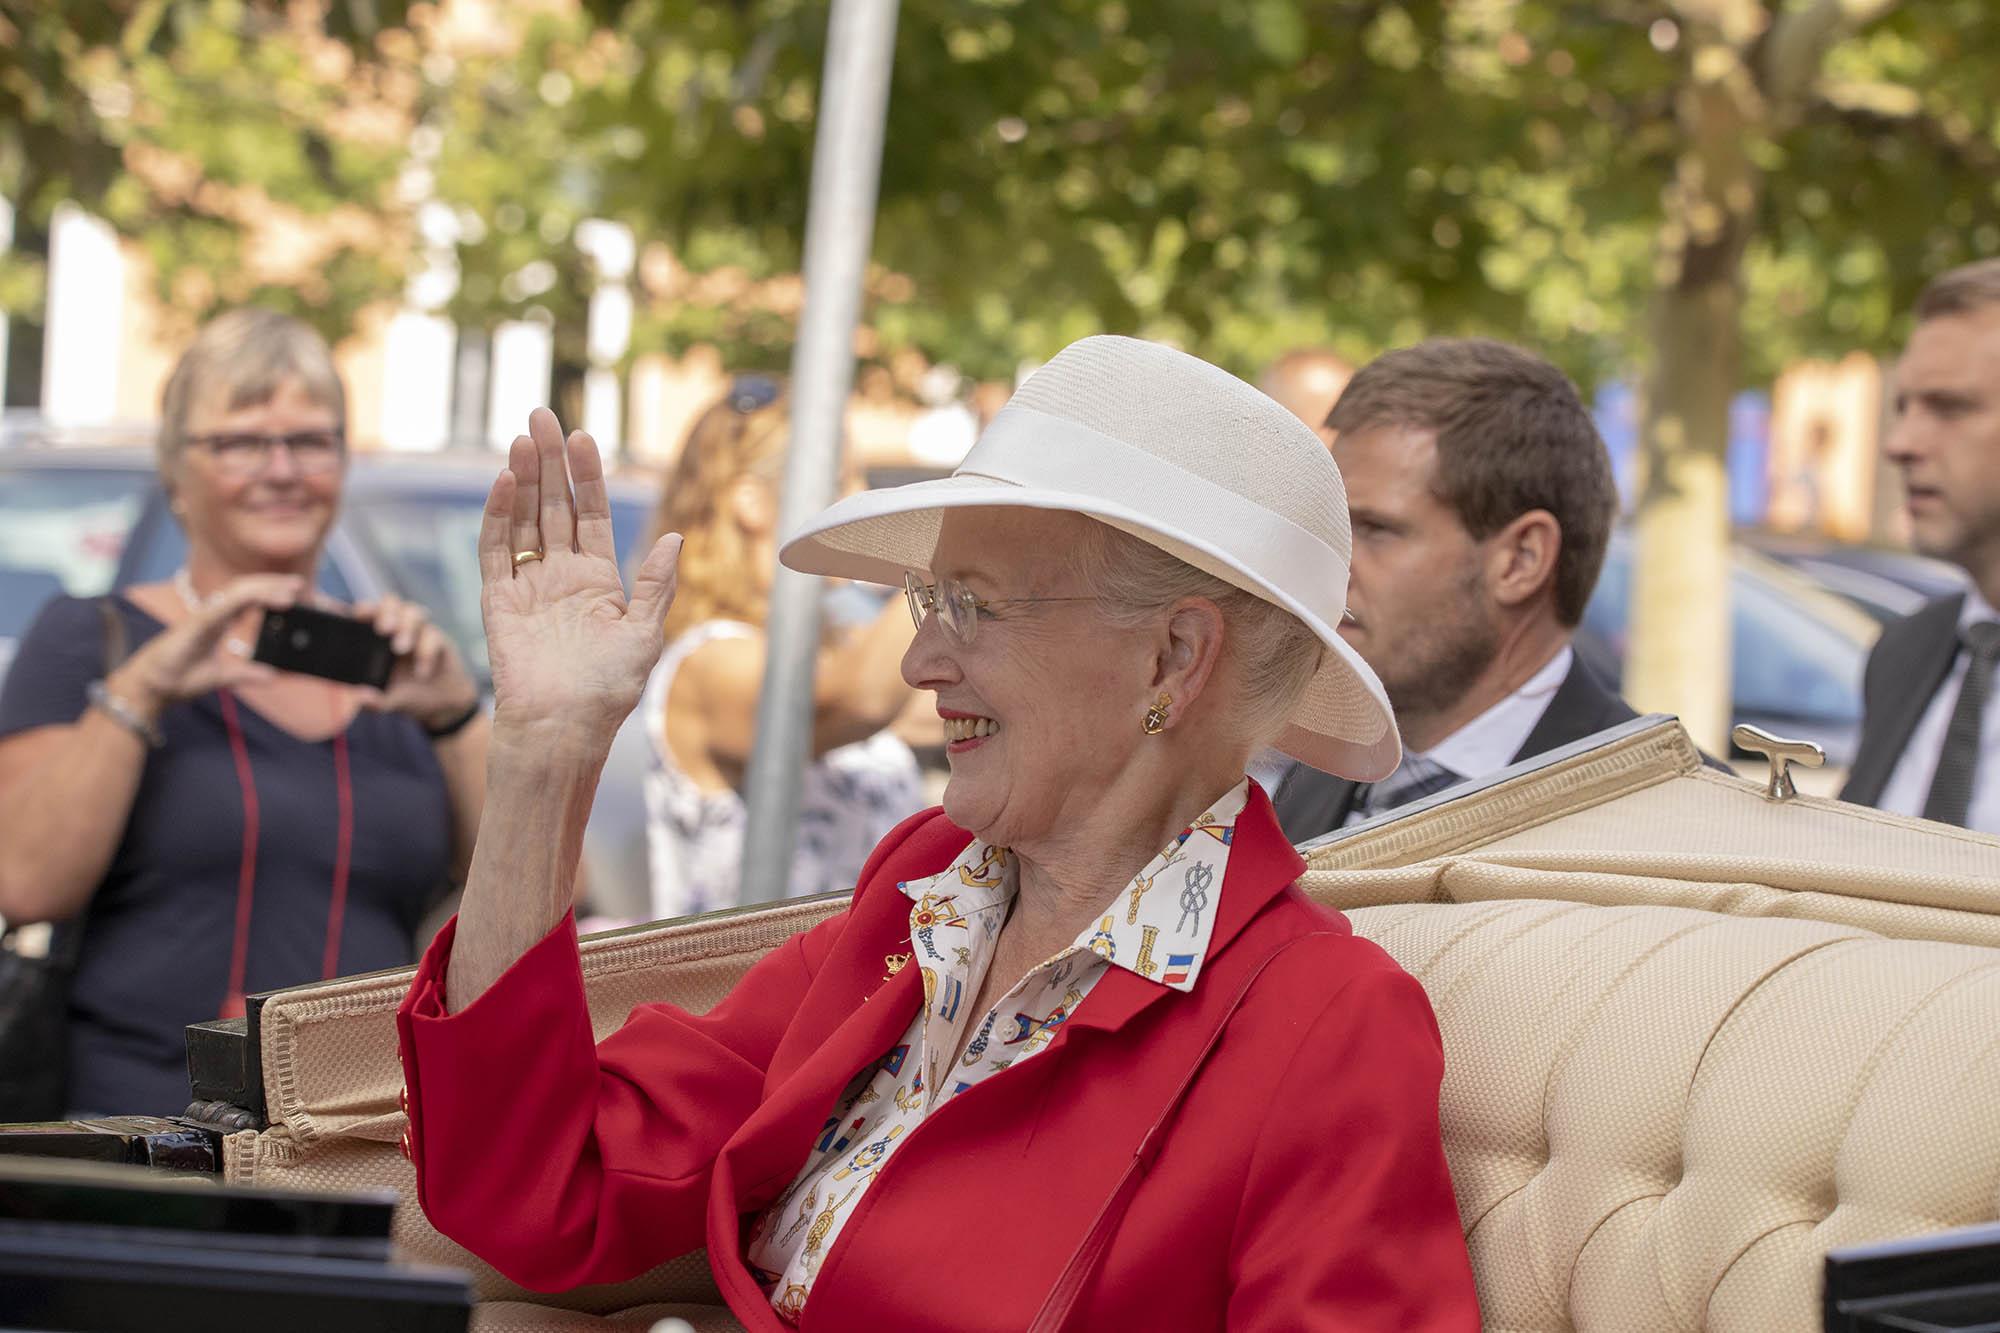 Dronning Margrethe besøger Svendborg 6-7 september 2018.